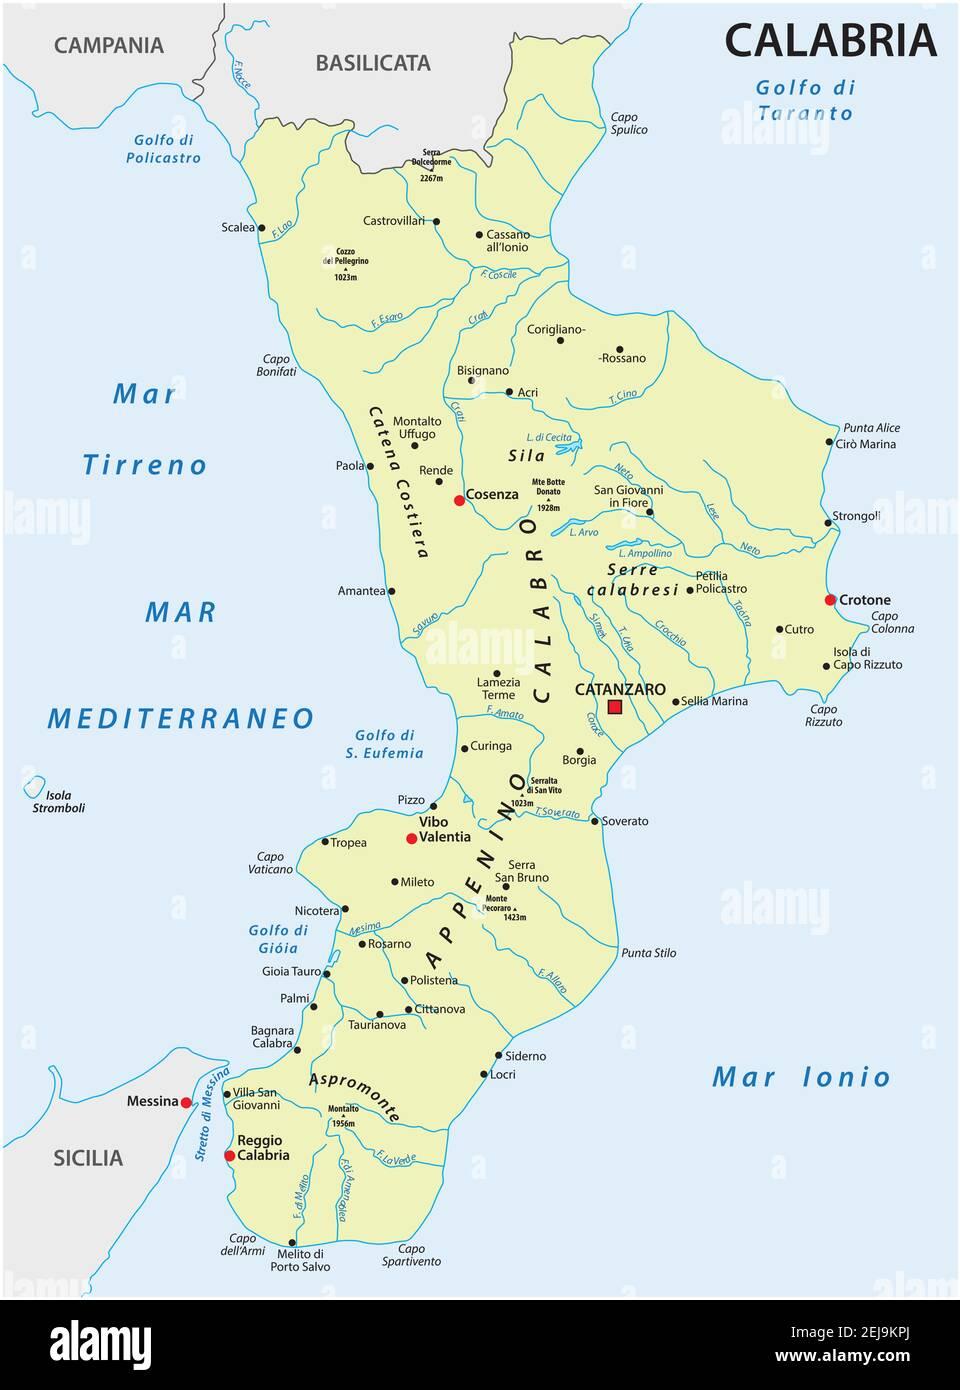 Regione Calabria Cartina Politica.Calabria Region Map Immagini E Fotos Stock Alamy